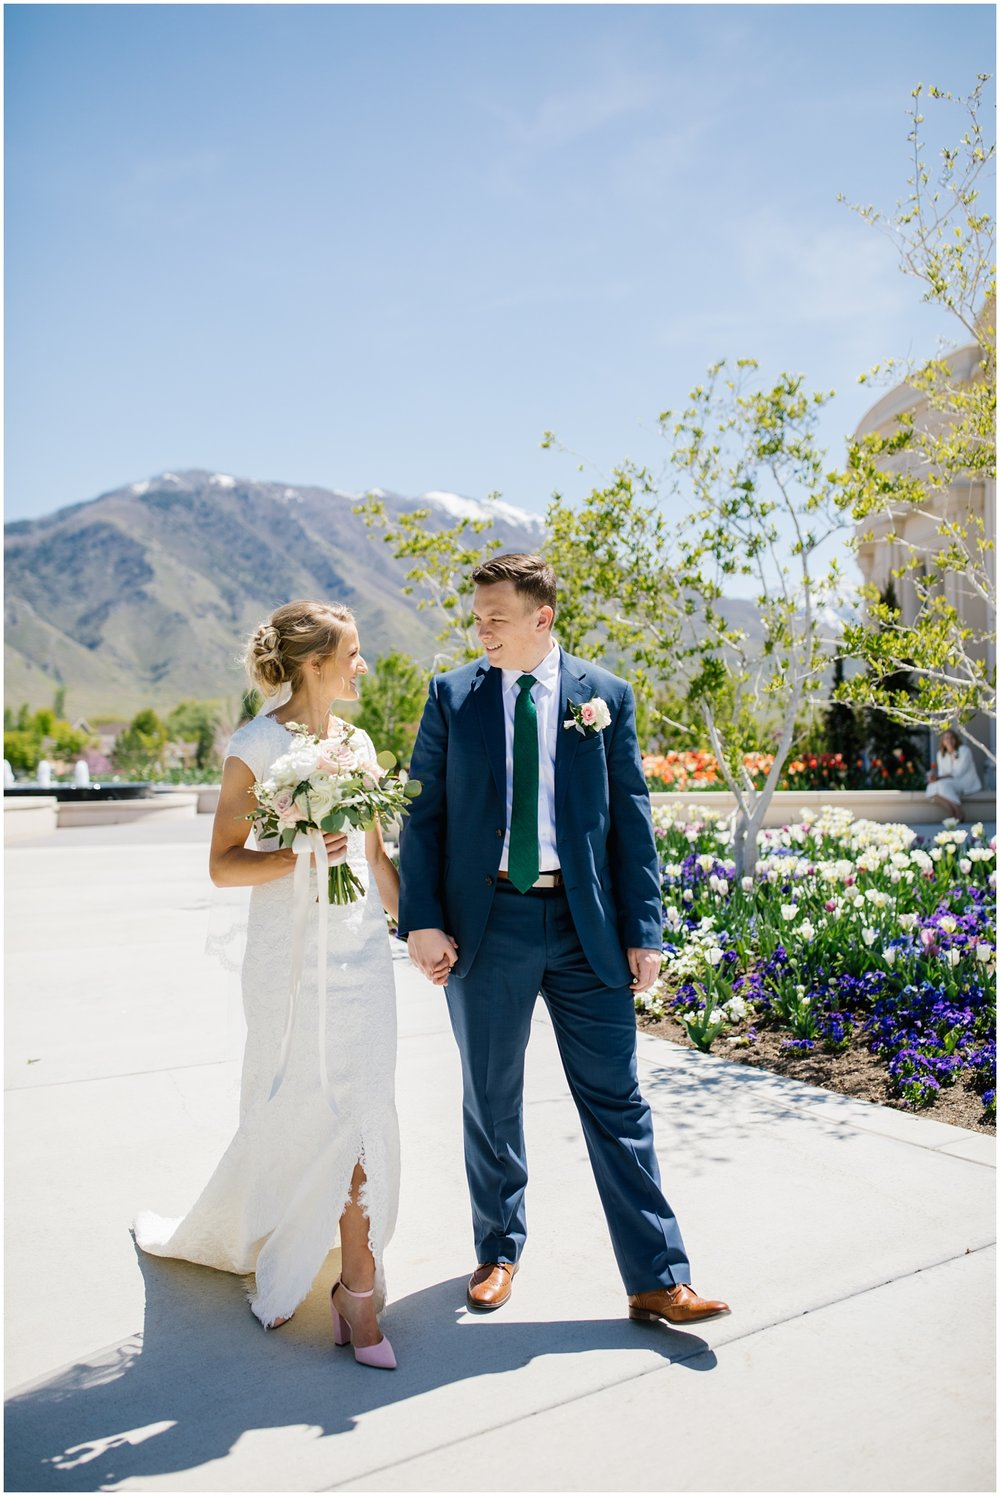 TA-Wedding-160_Lizzie-B-Imagery-Utah-Wedding-Photographer-Park-City-Salt-Lake-City-Thanksgiving-Point-Ashton-Gardens-Lehi-Utah.jpg